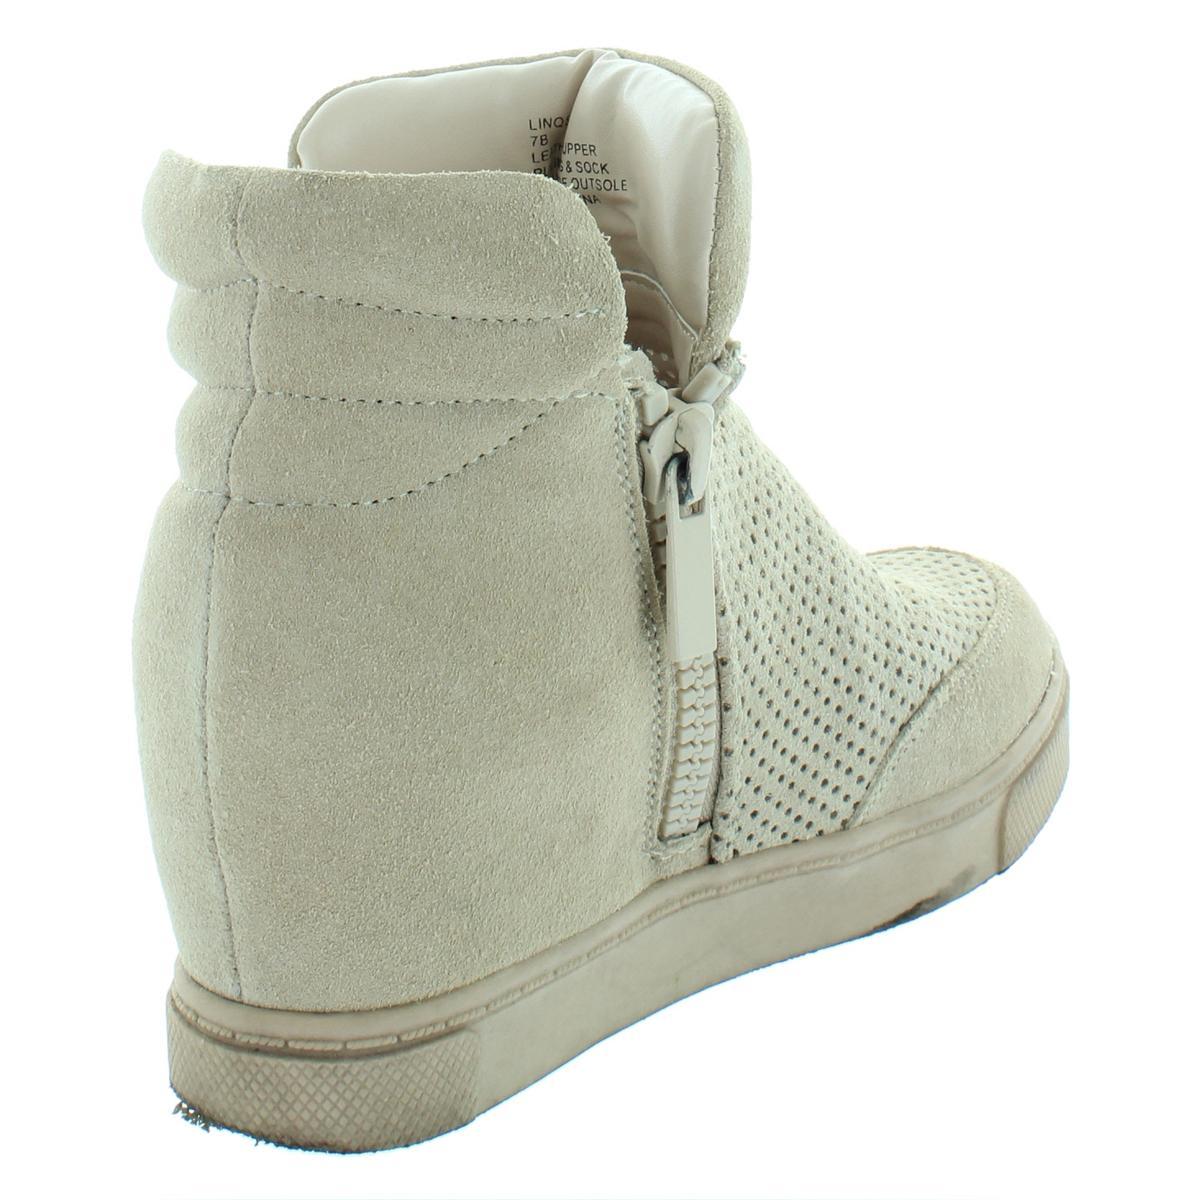 322285e7d358 Details about Steve Madden Womens Linqsp Tan Fashion Sneakers Shoes 7  Medium (B